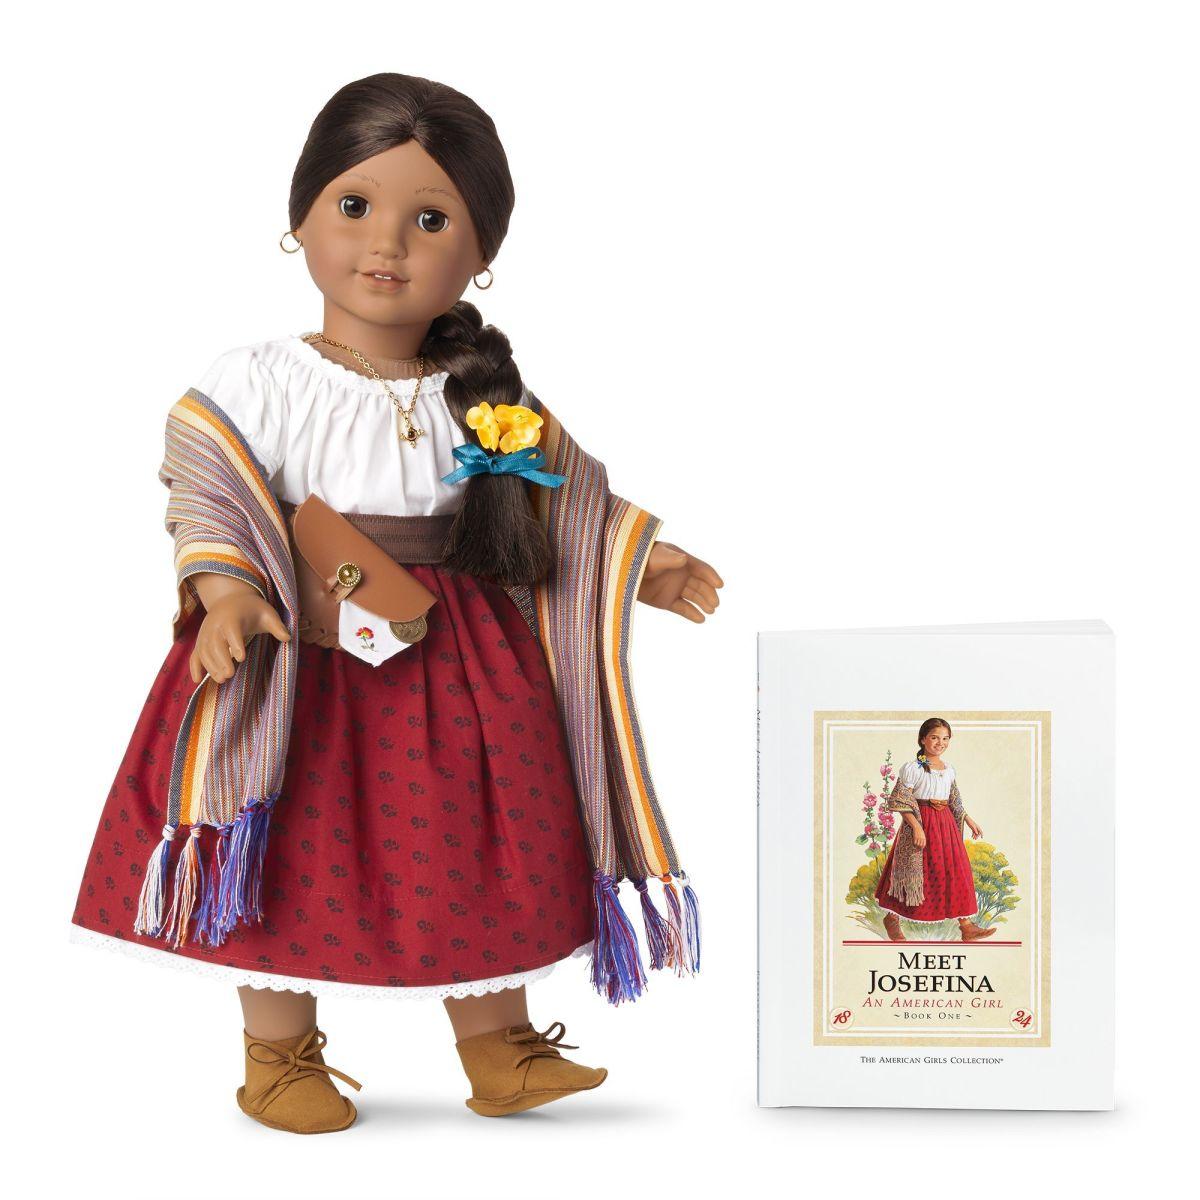 Josefina's 35th Anniversary Collection